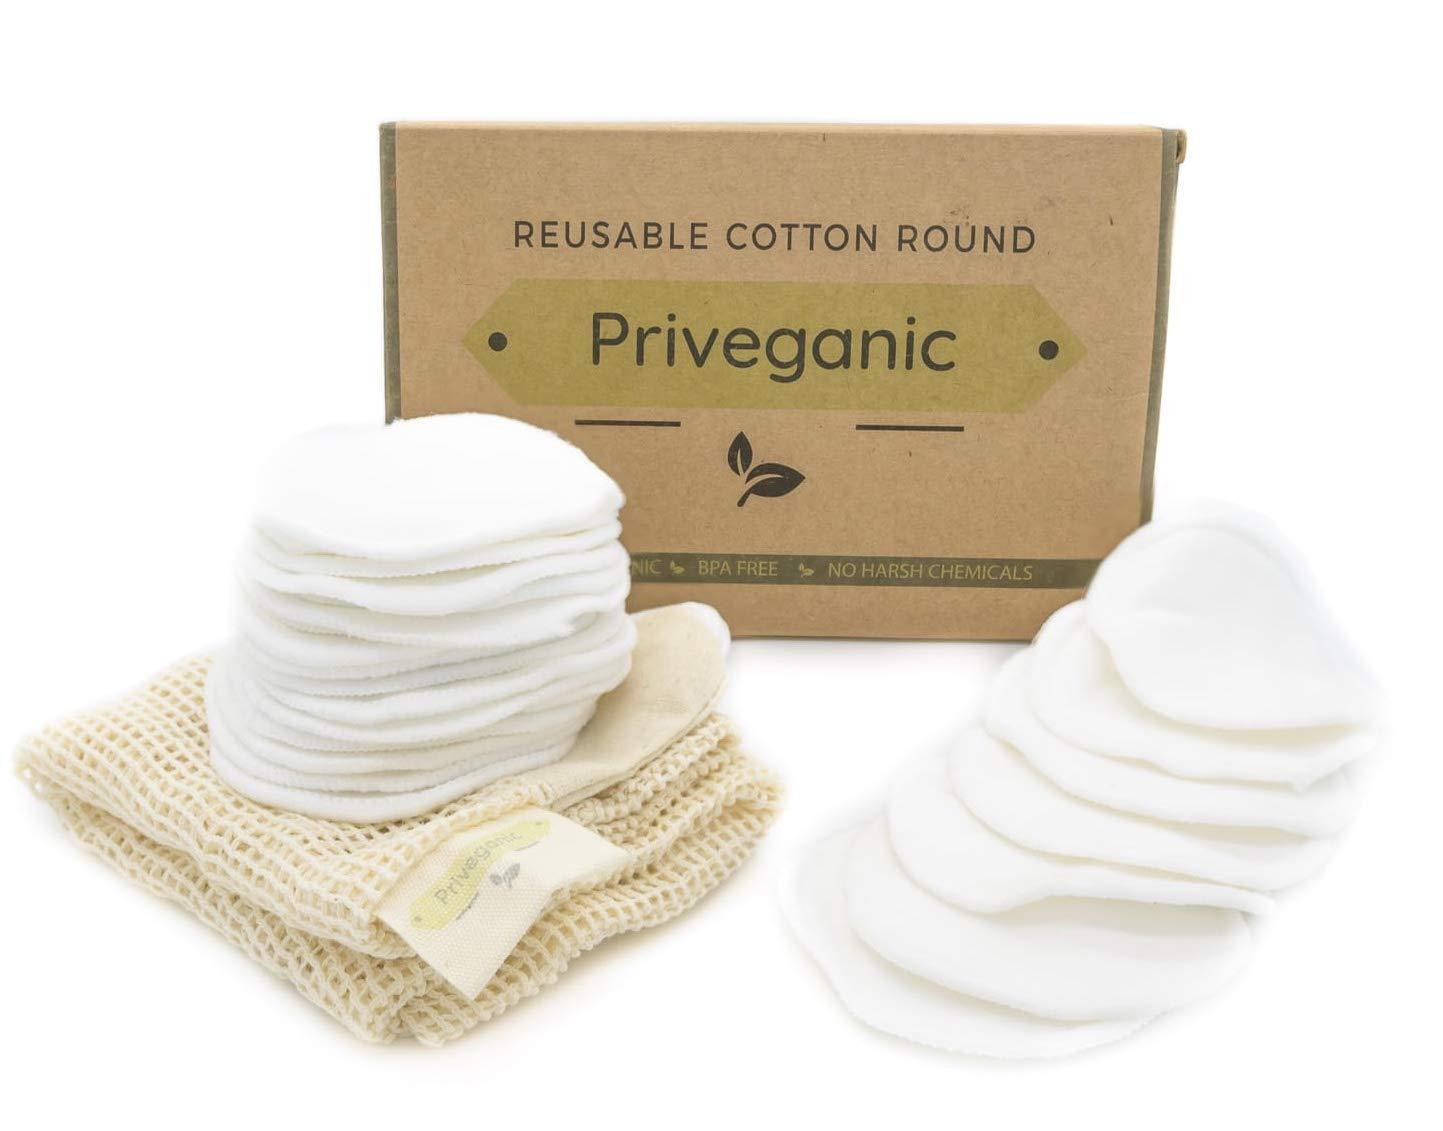 Reusable Cotton Round makeup removing pads 24 pads per box Premium 100% organic cotton rounds